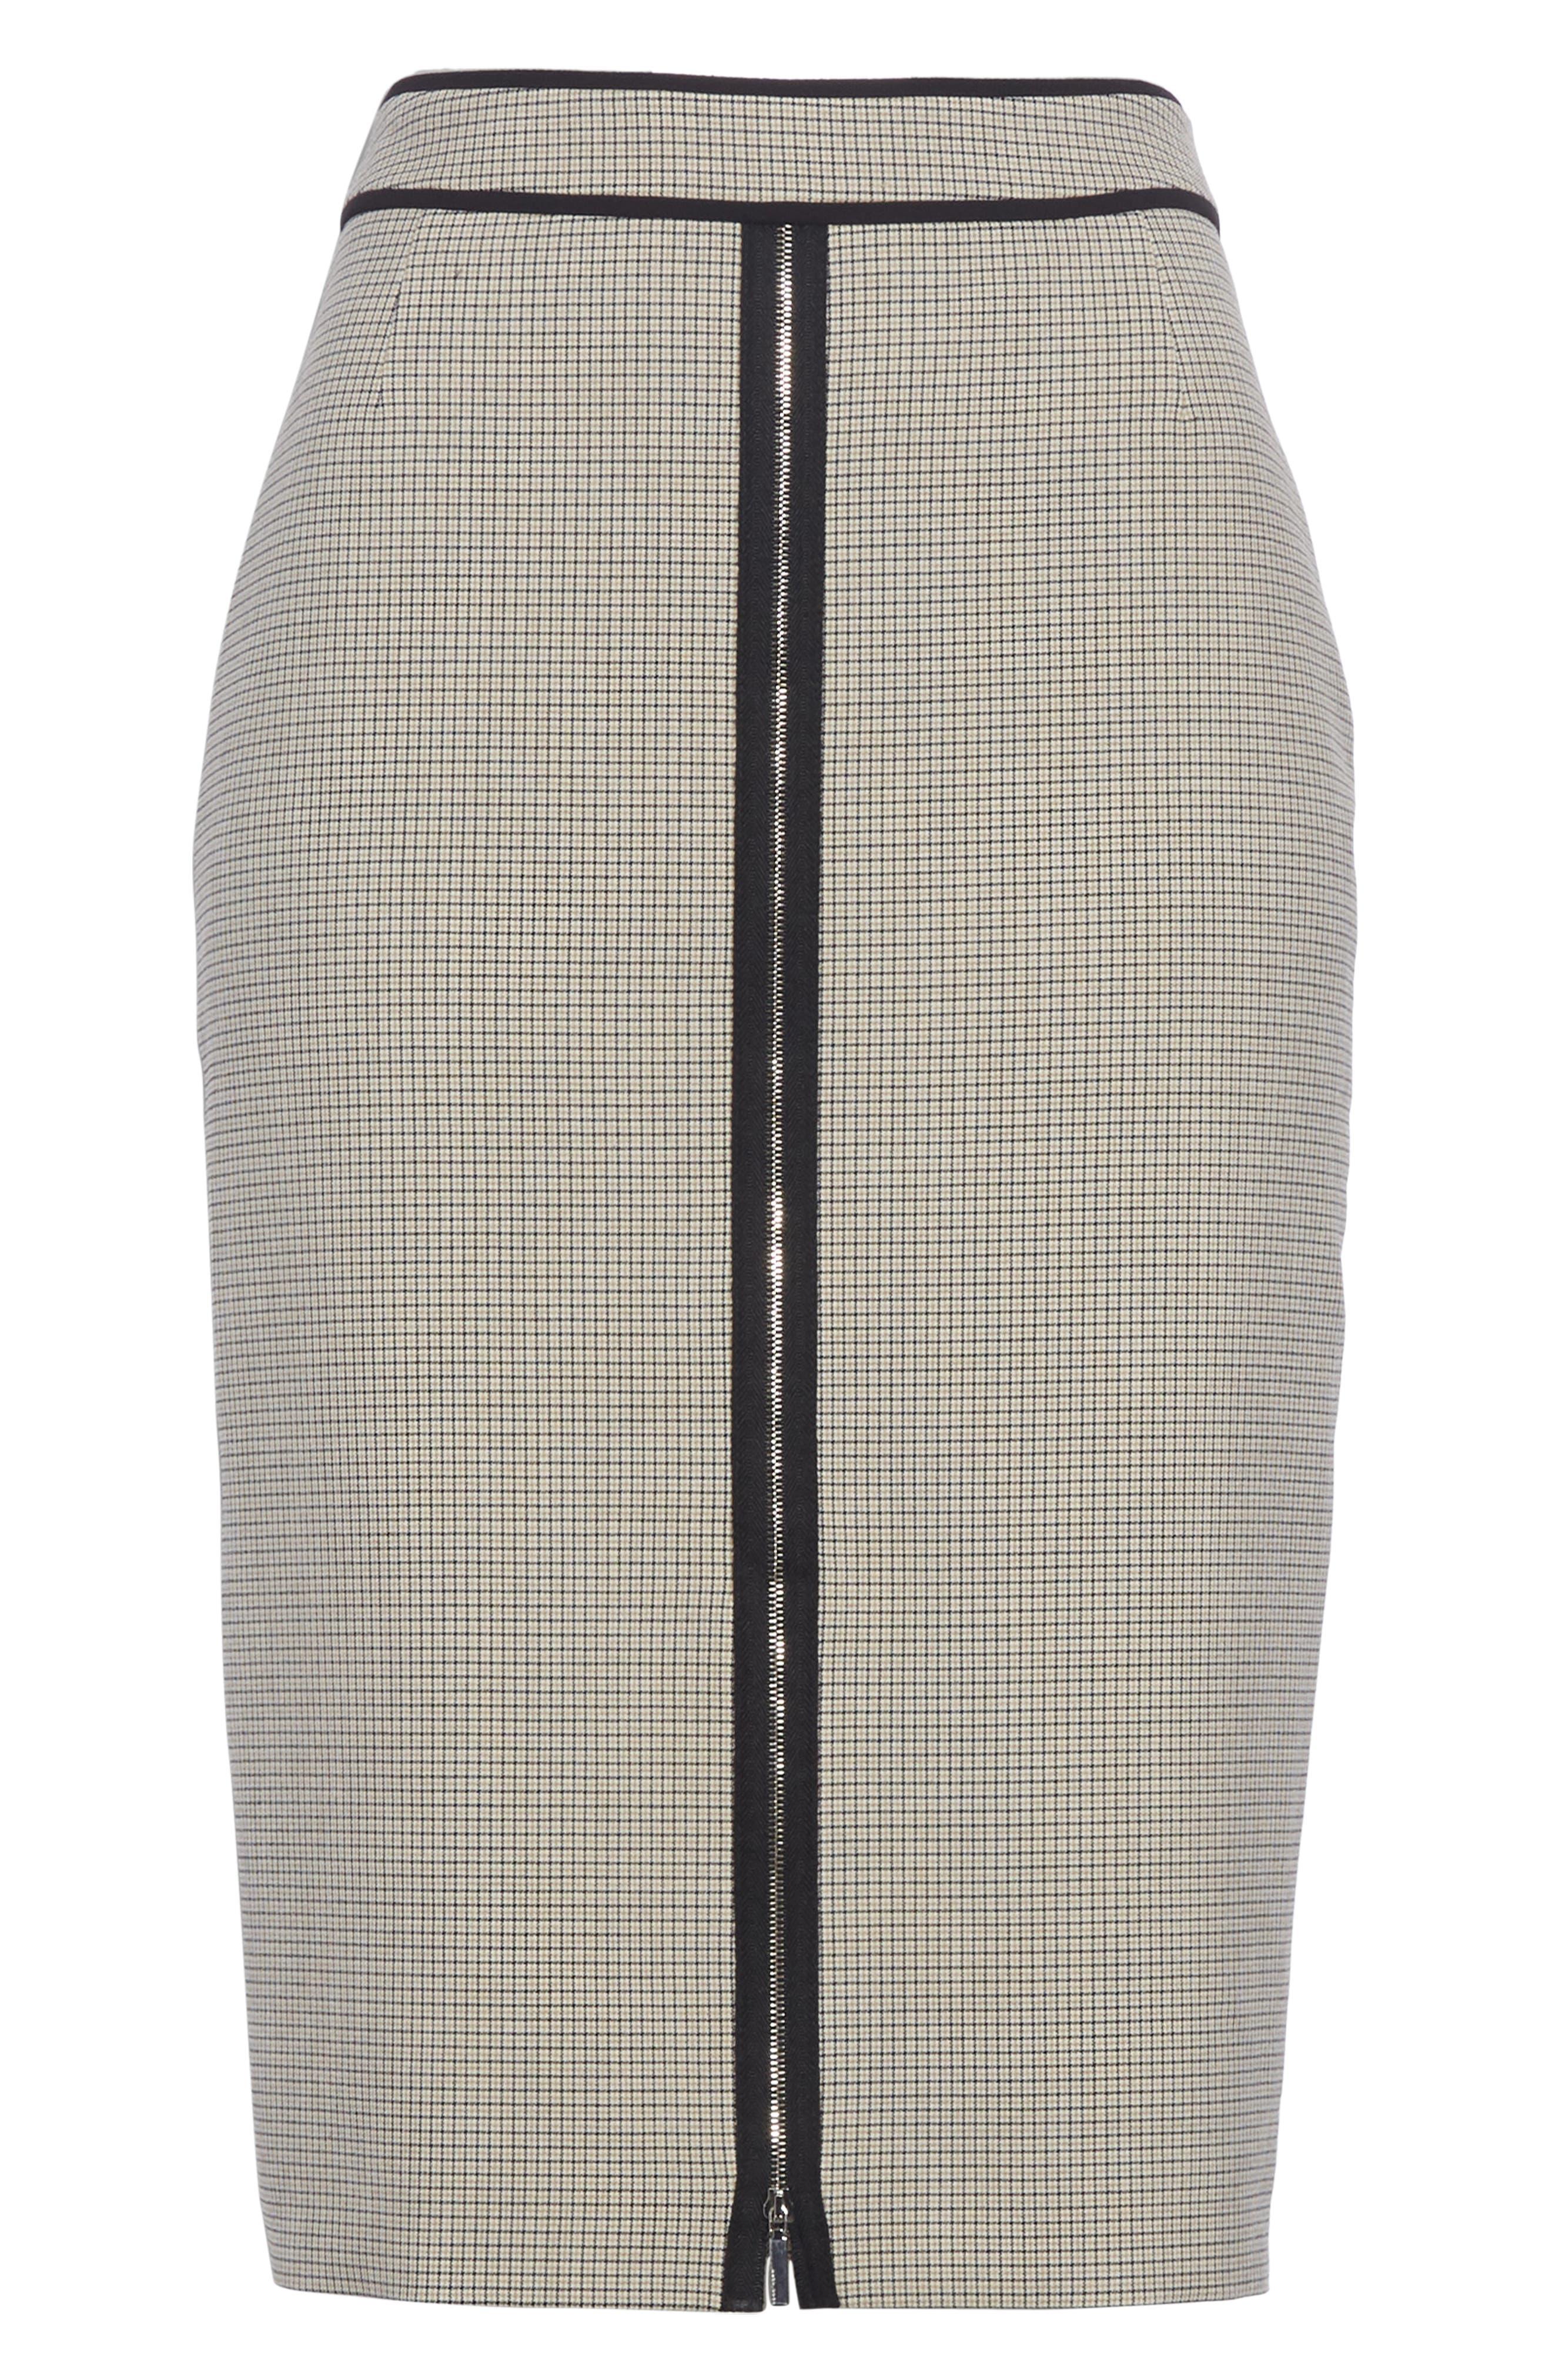 Voliviena Pencil Skirt,                             Alternate thumbnail 6, color,                             STONE FANTASTY